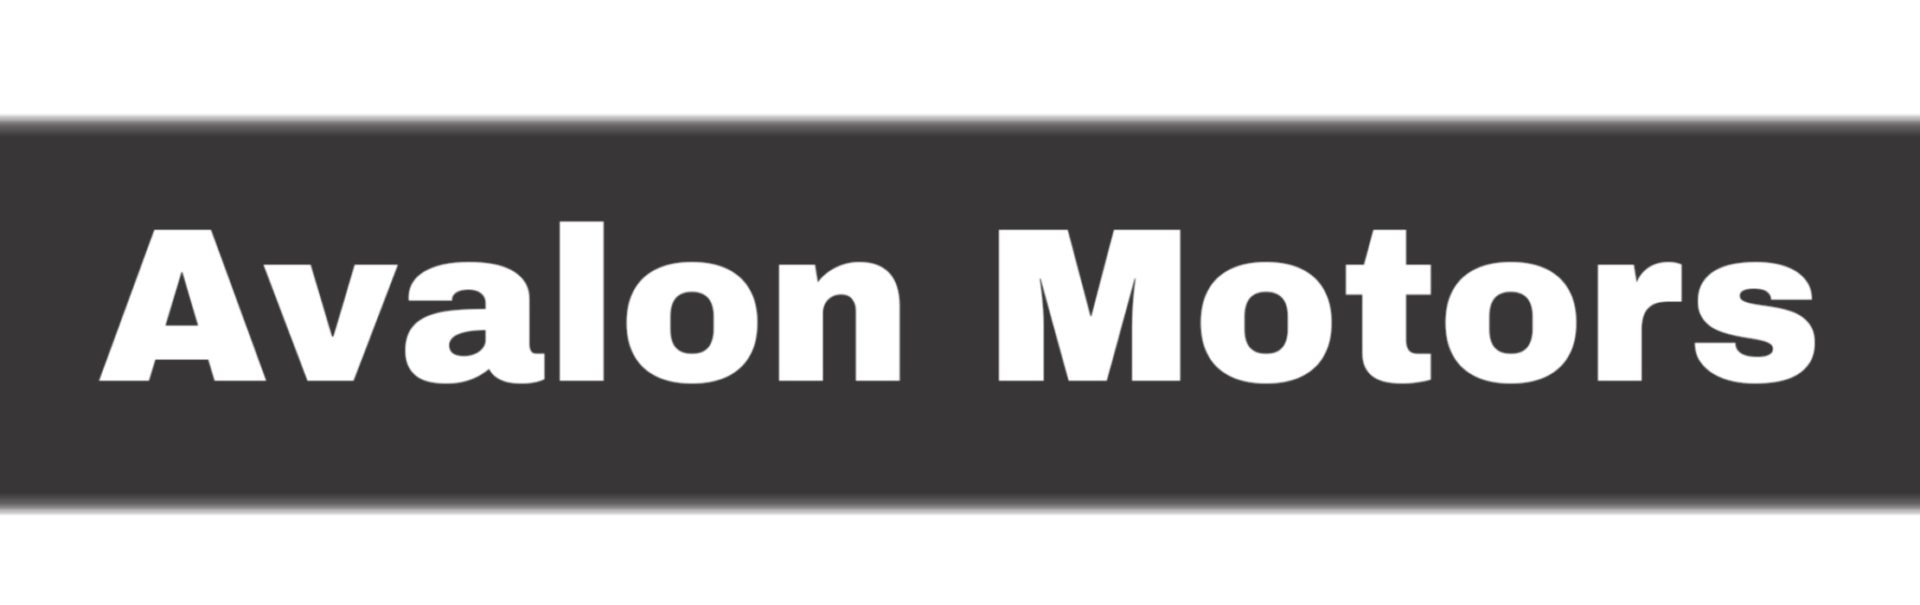 Avalon Motors - Lorena